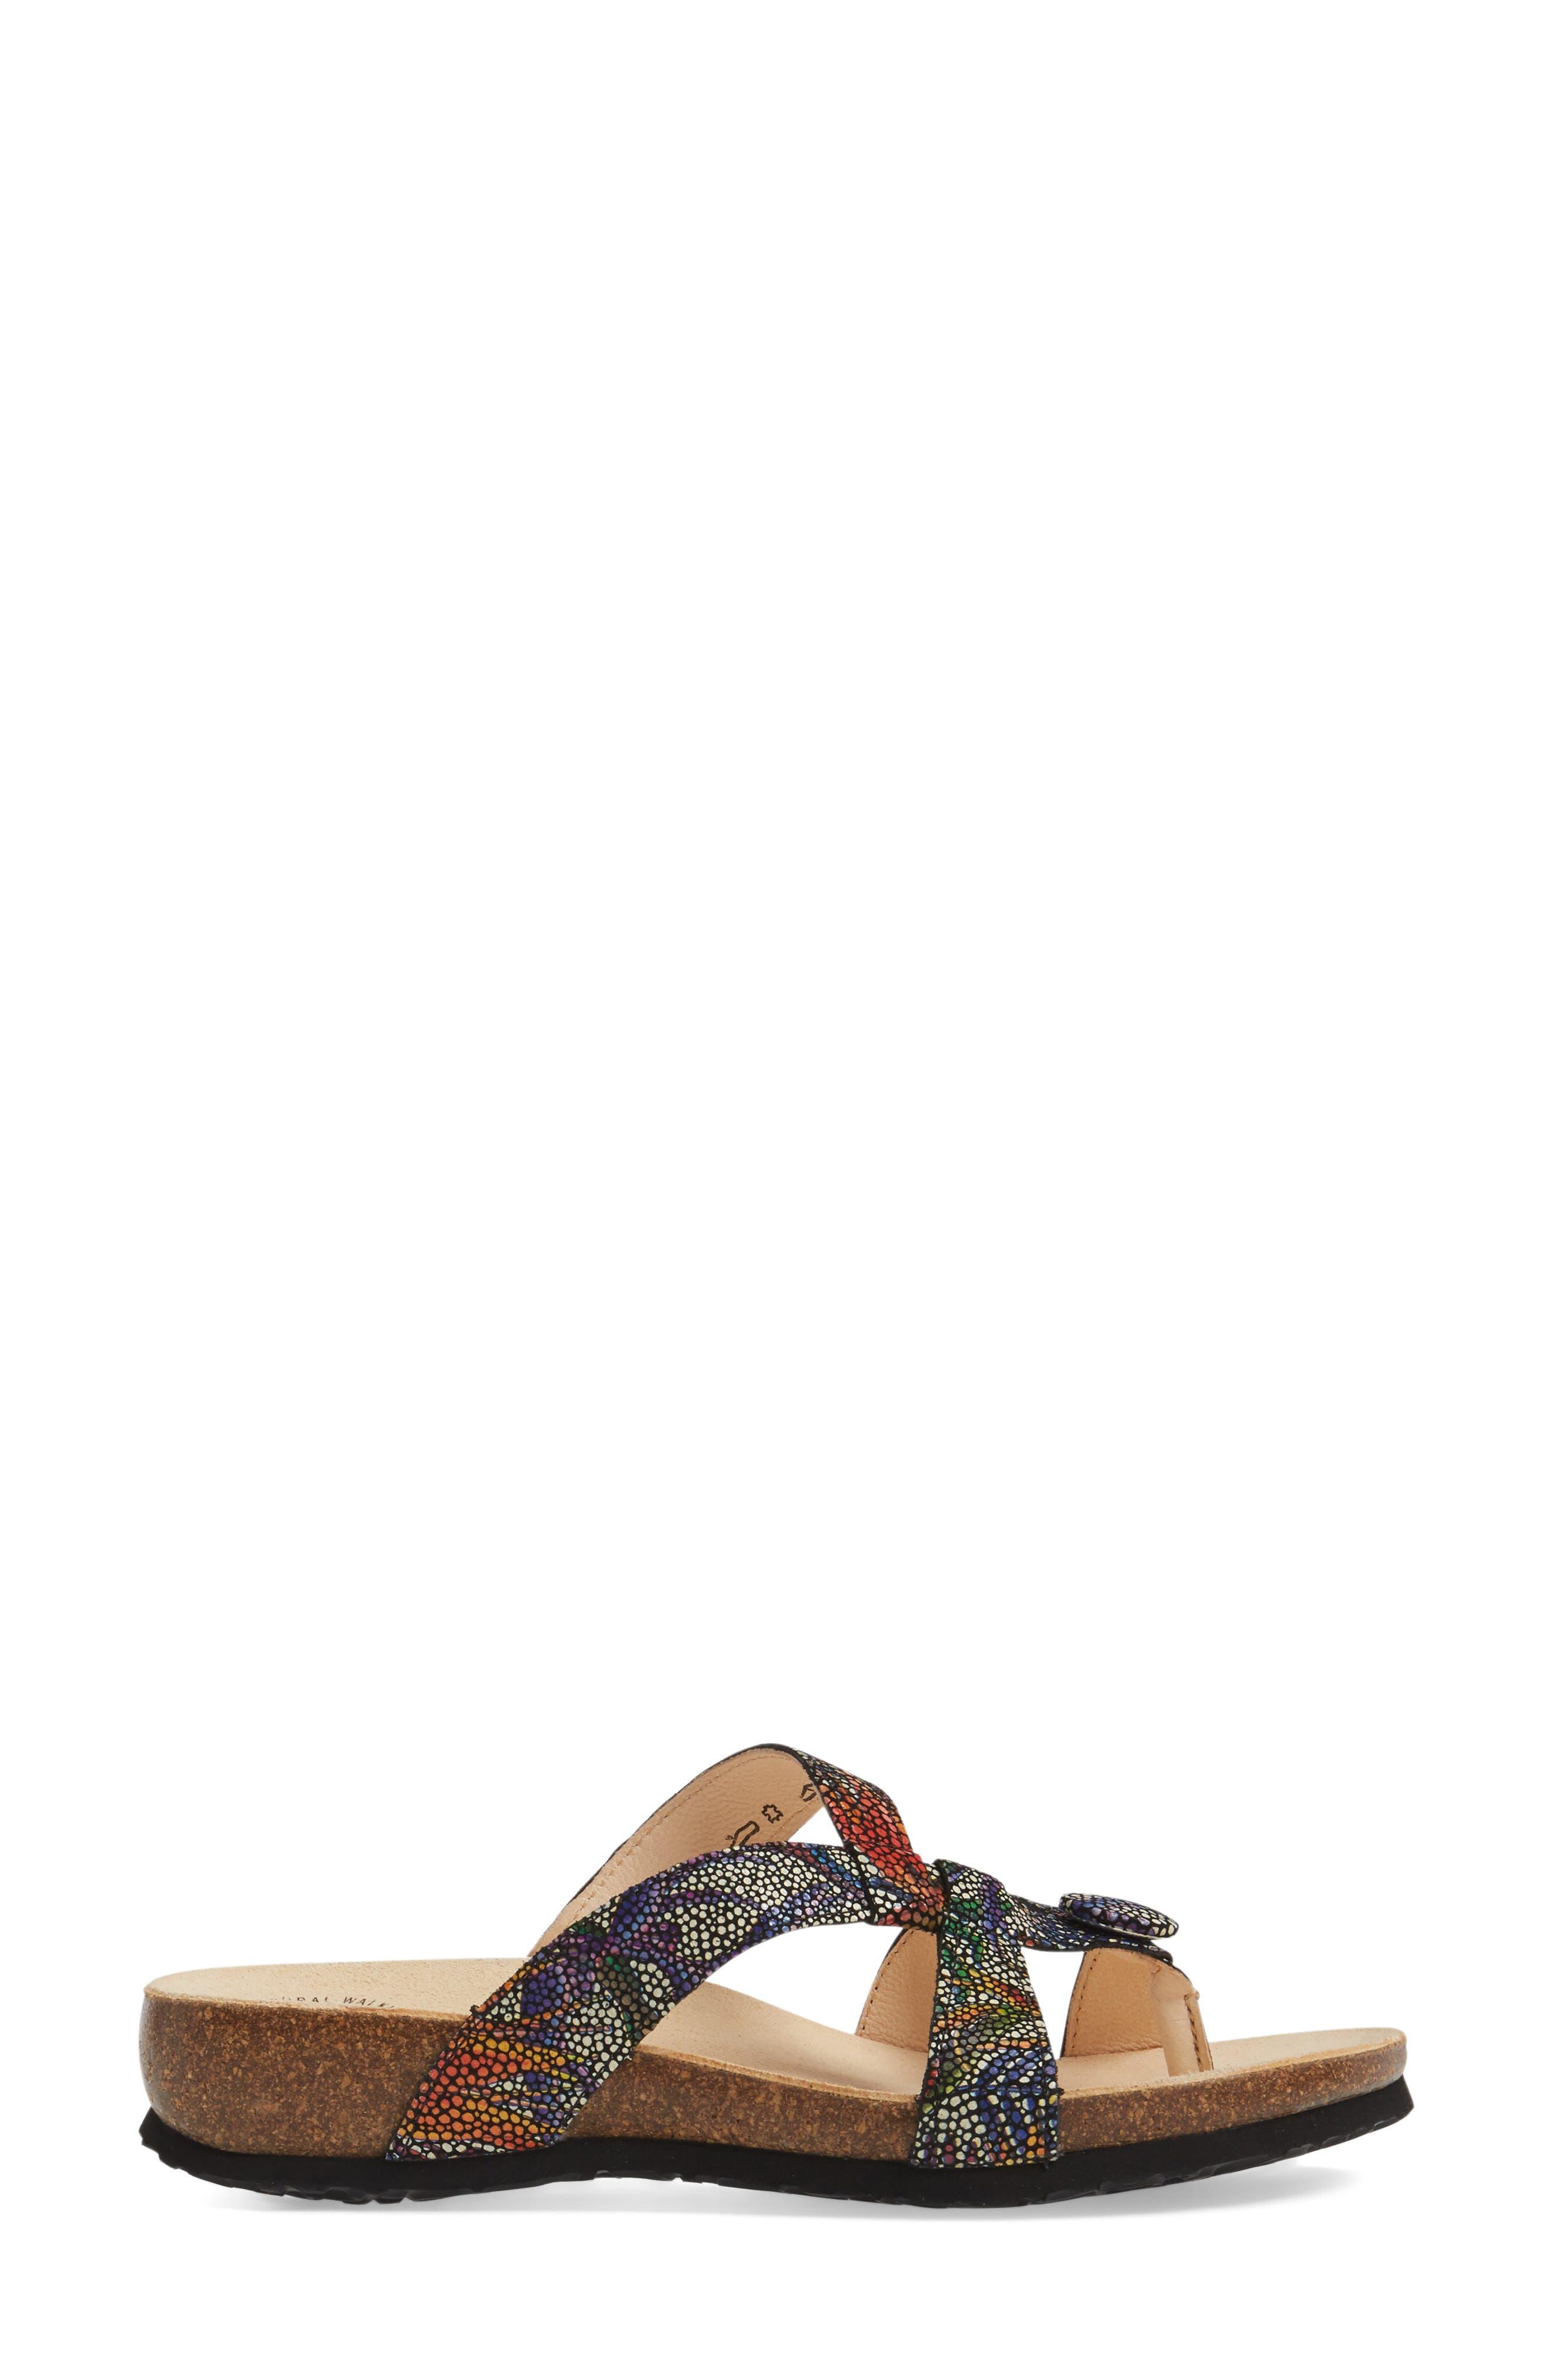 THINK!,                             'Julia Strappy' Sandal,                             Alternate thumbnail 3, color,                             BLACK NUBUCK LEATHER